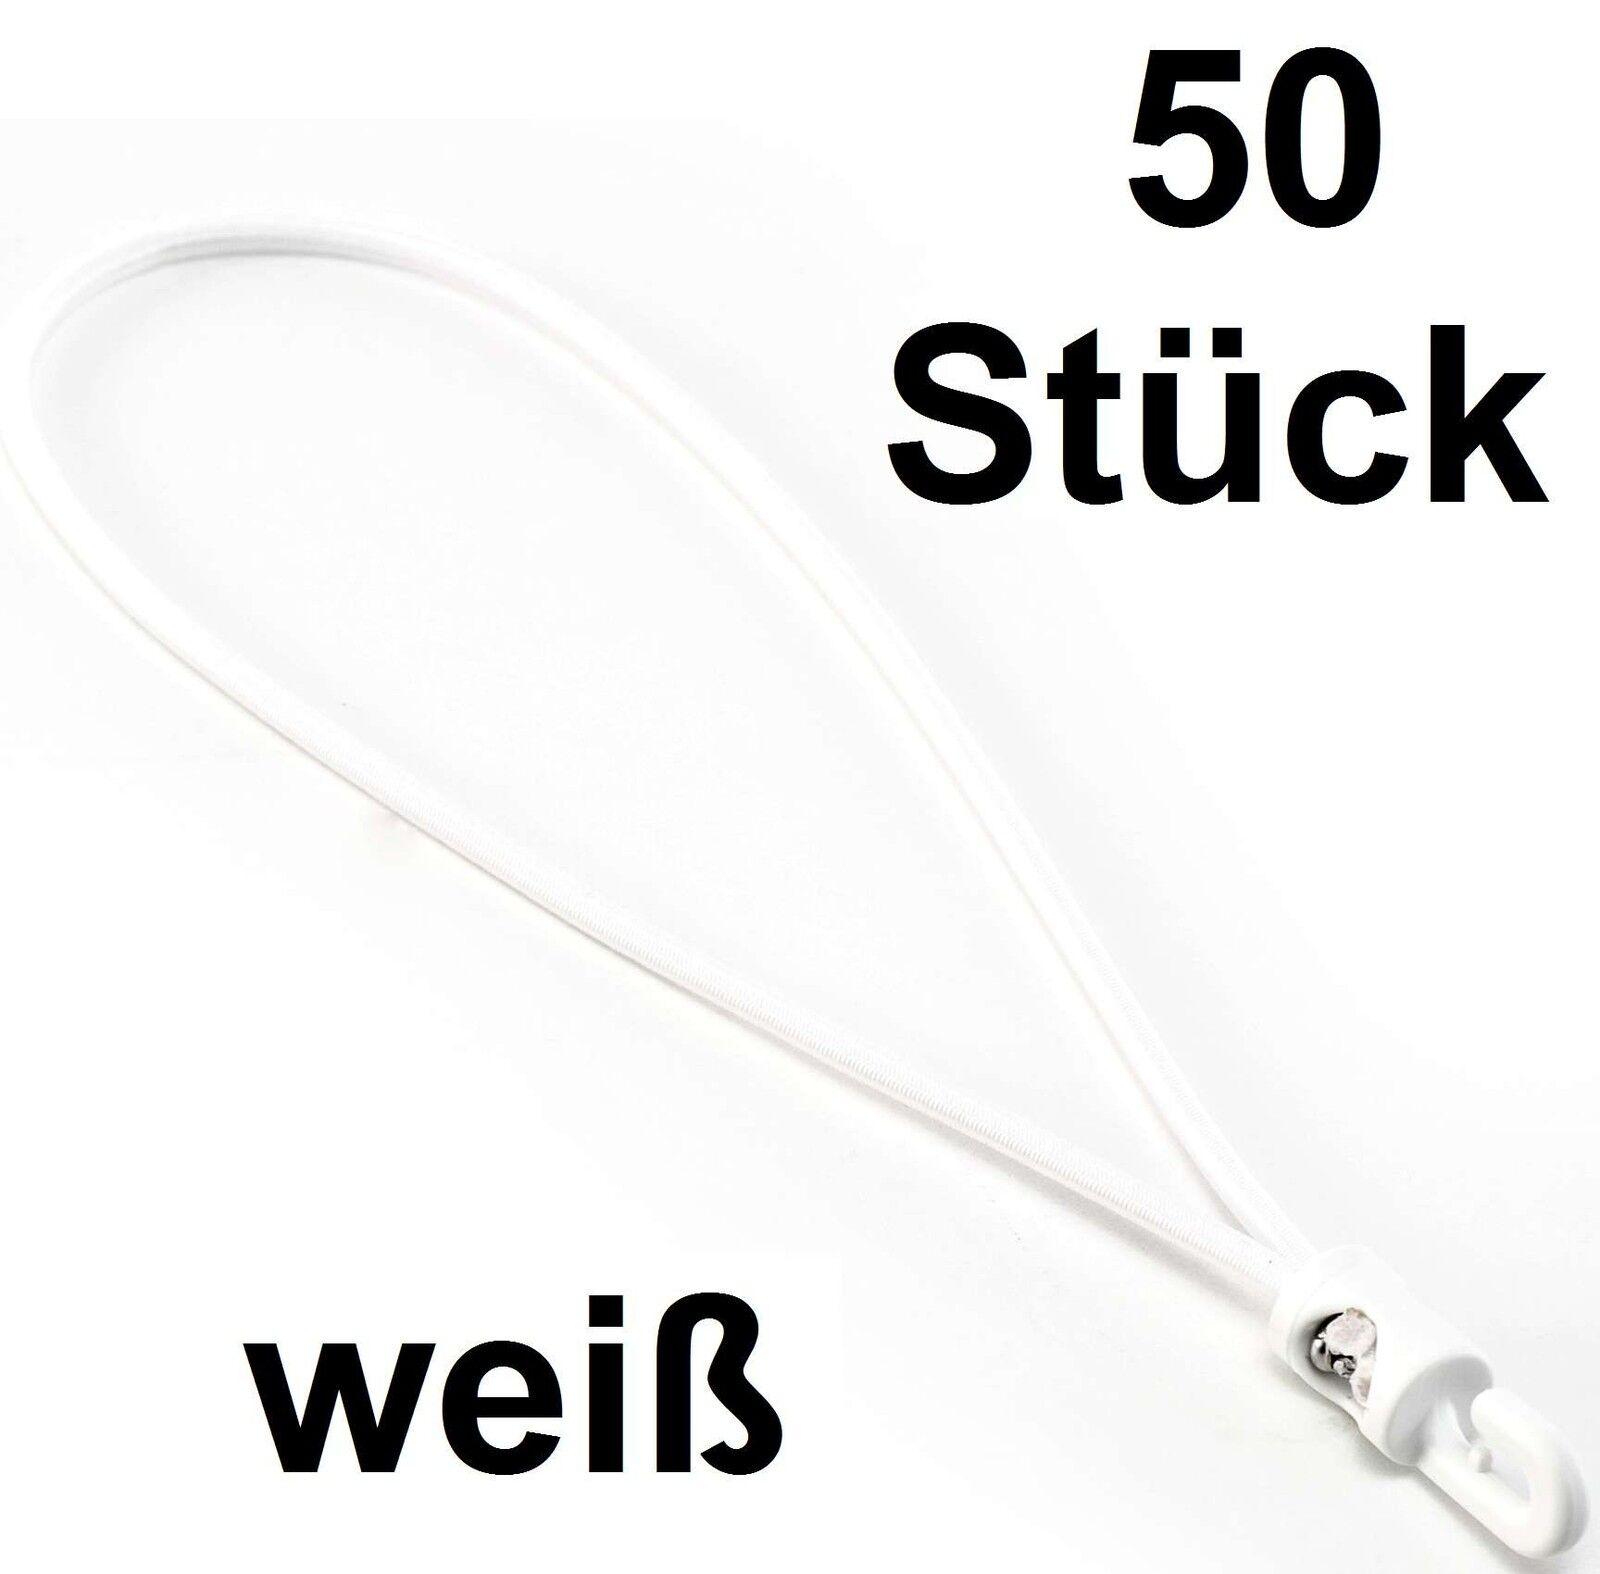 100x Gummi-Kabelbinder 27cm x 4mm grau Spannfixe Spanngummi Spannfix Expander